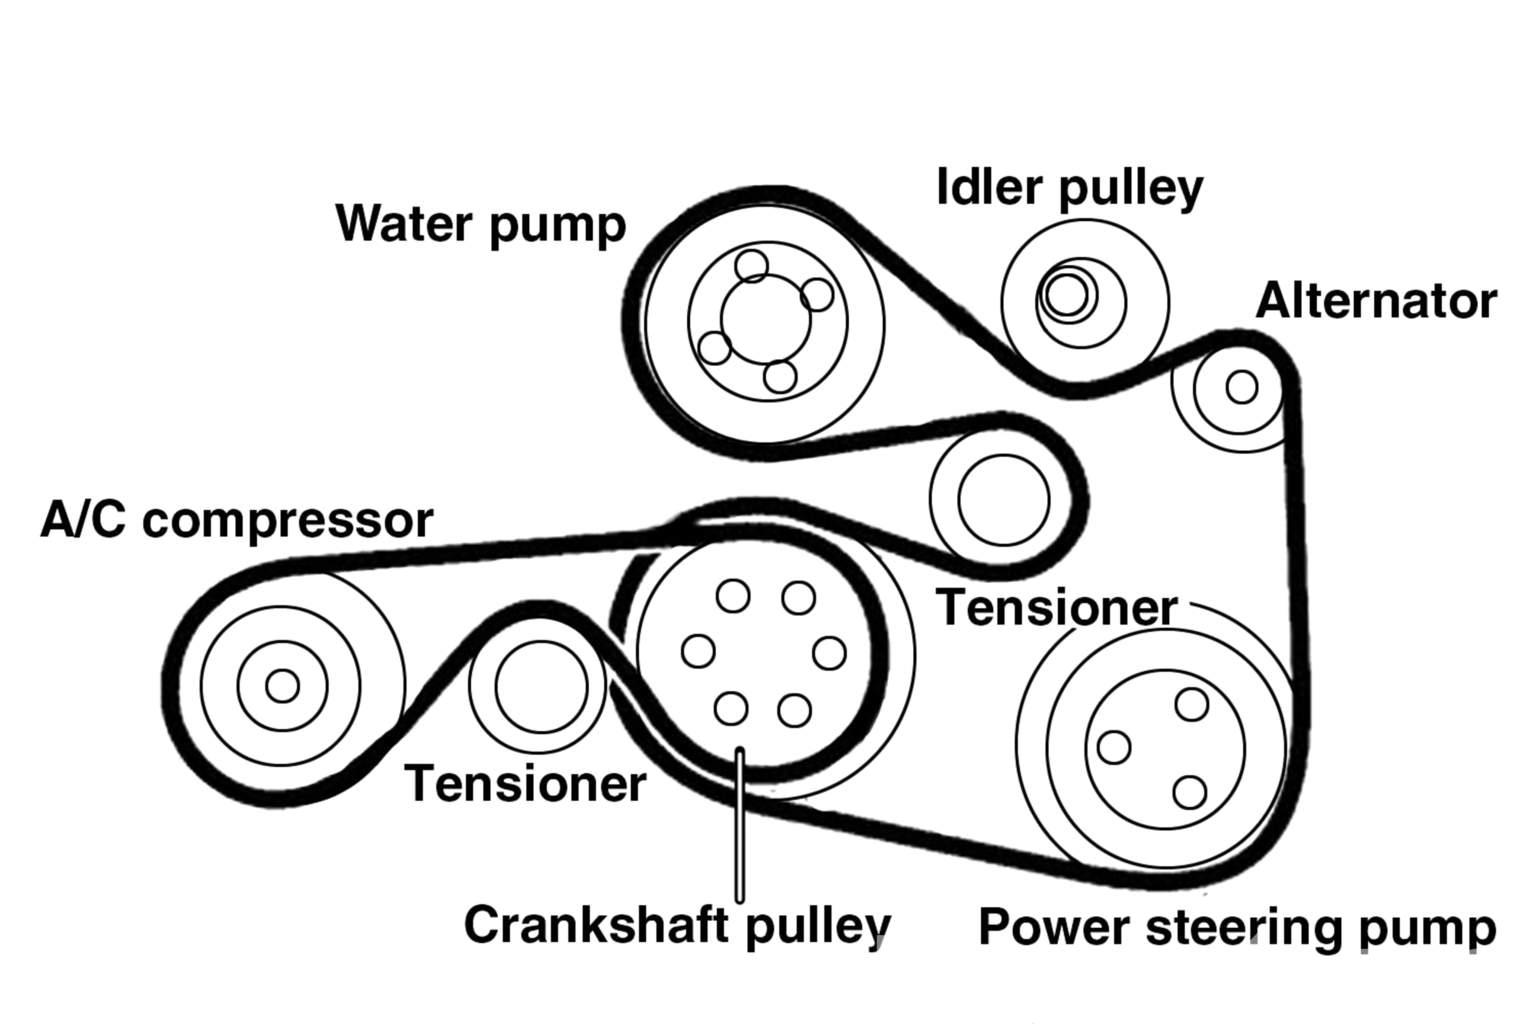 2006 bmw 325i engine diagram 2002 vw jetta ac wiring e46 fuel pump relay free image for user